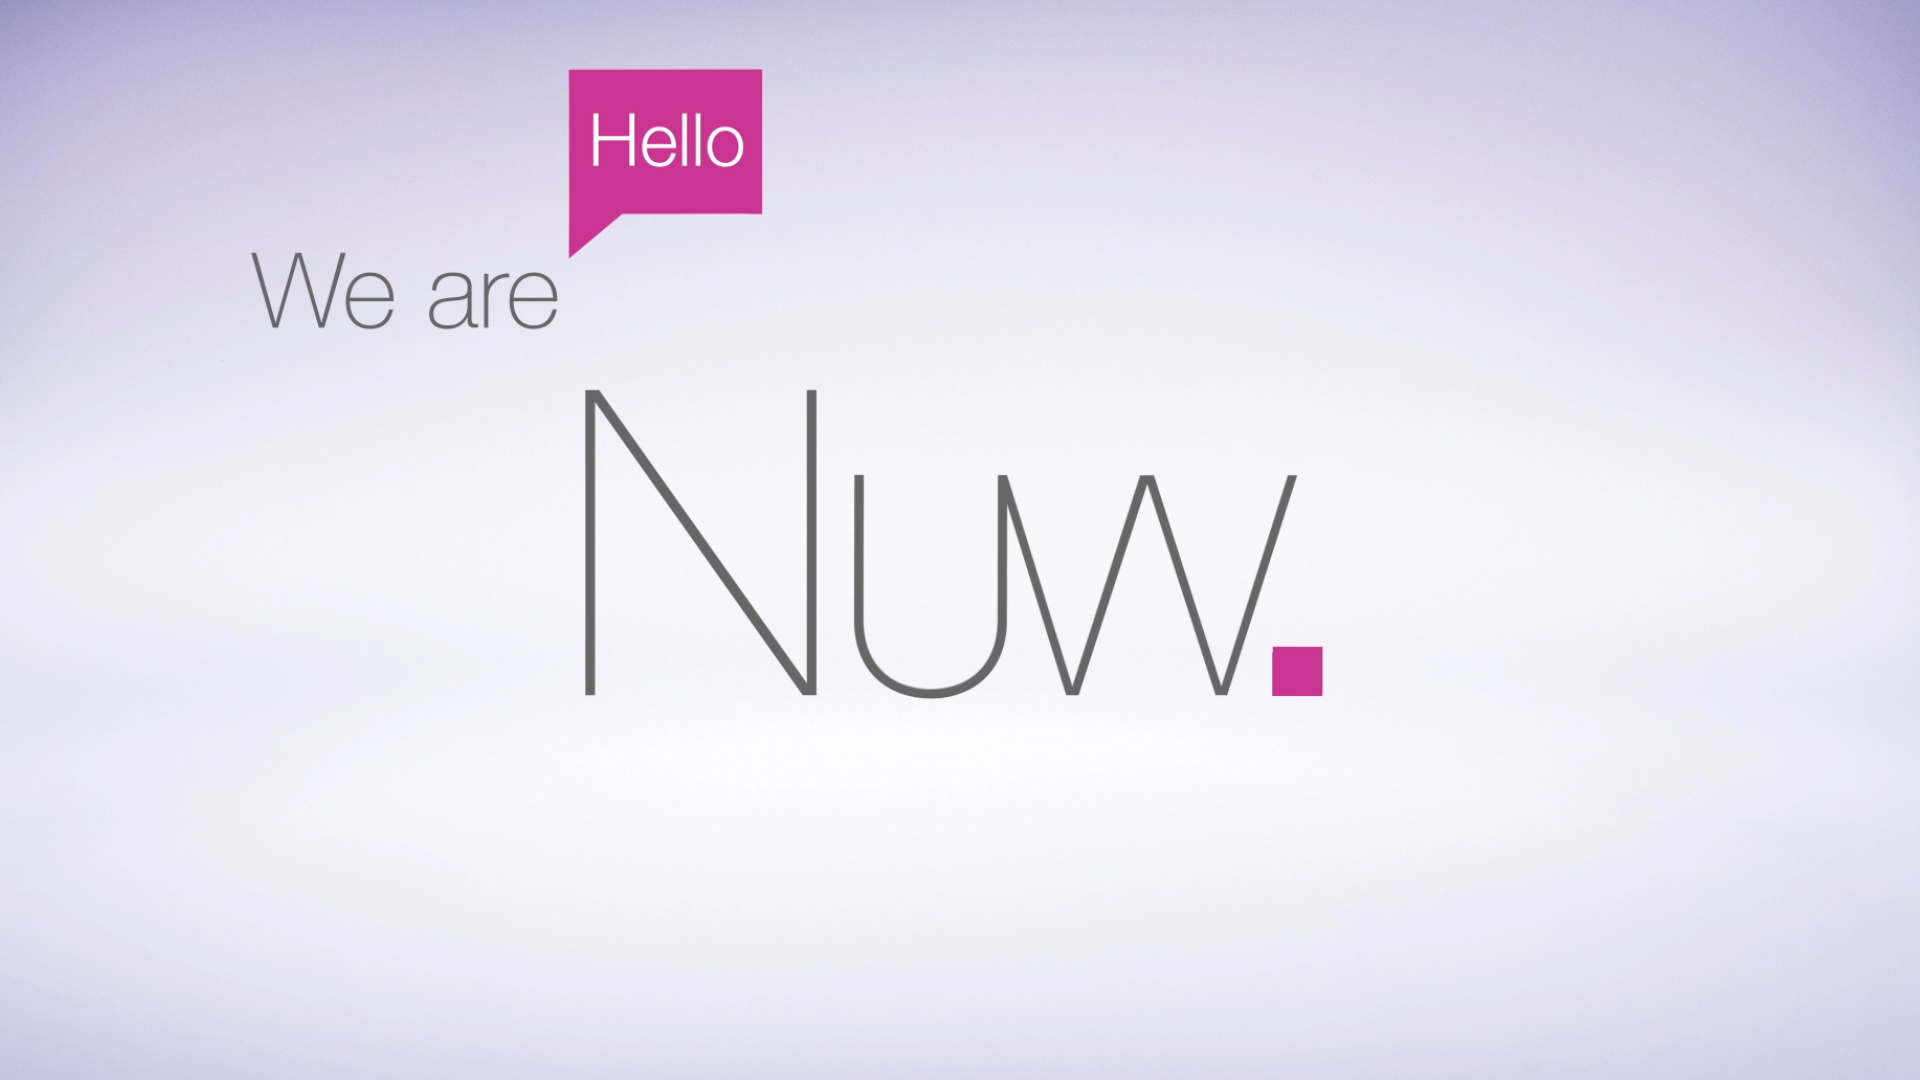 NUW Creatives